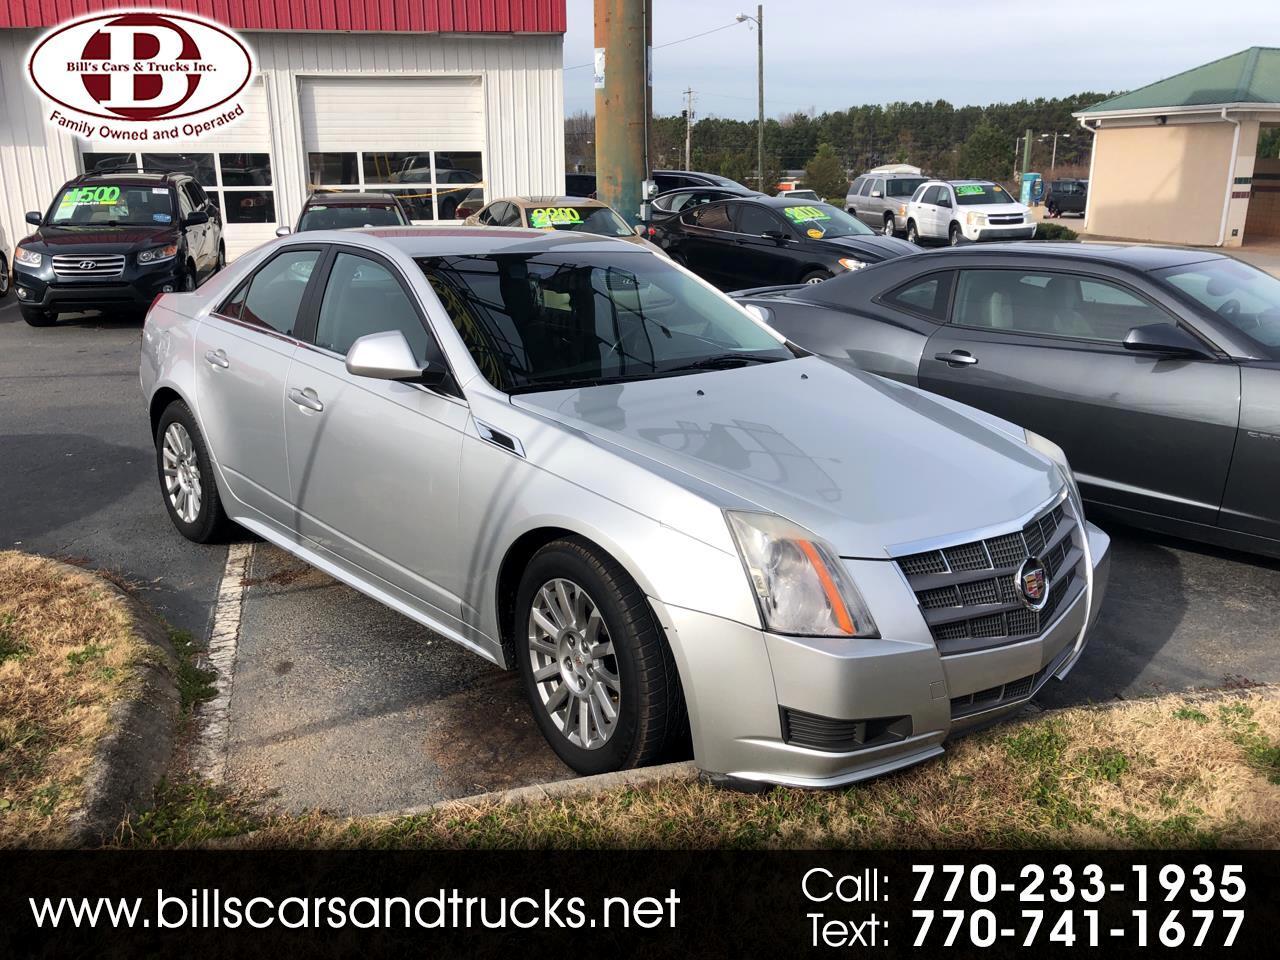 2011 Cadillac CTS Sedan 4dr Sdn 3.0L RWD